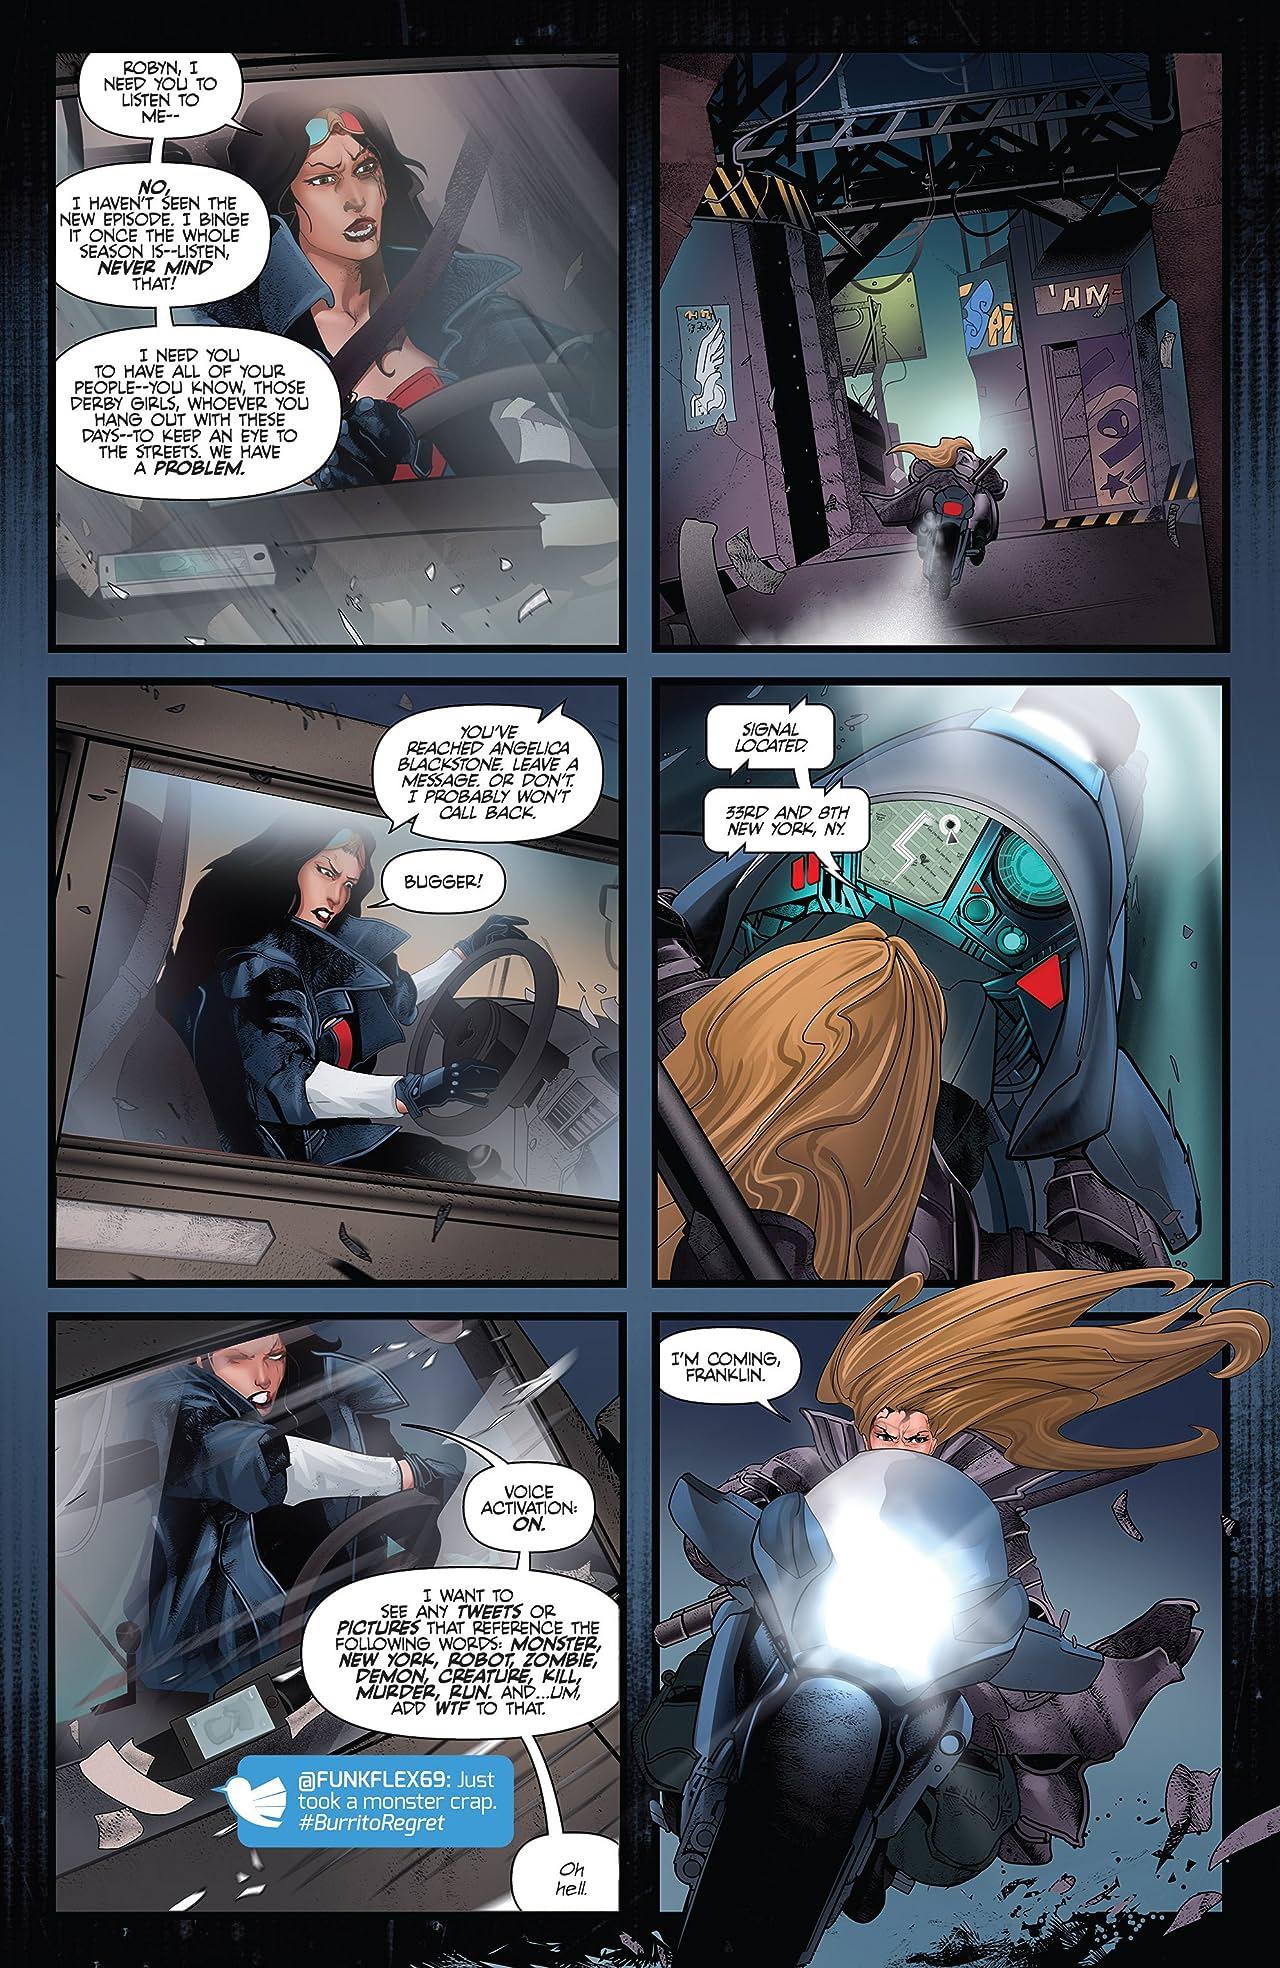 Van Helsing vs. Frankenstein #4